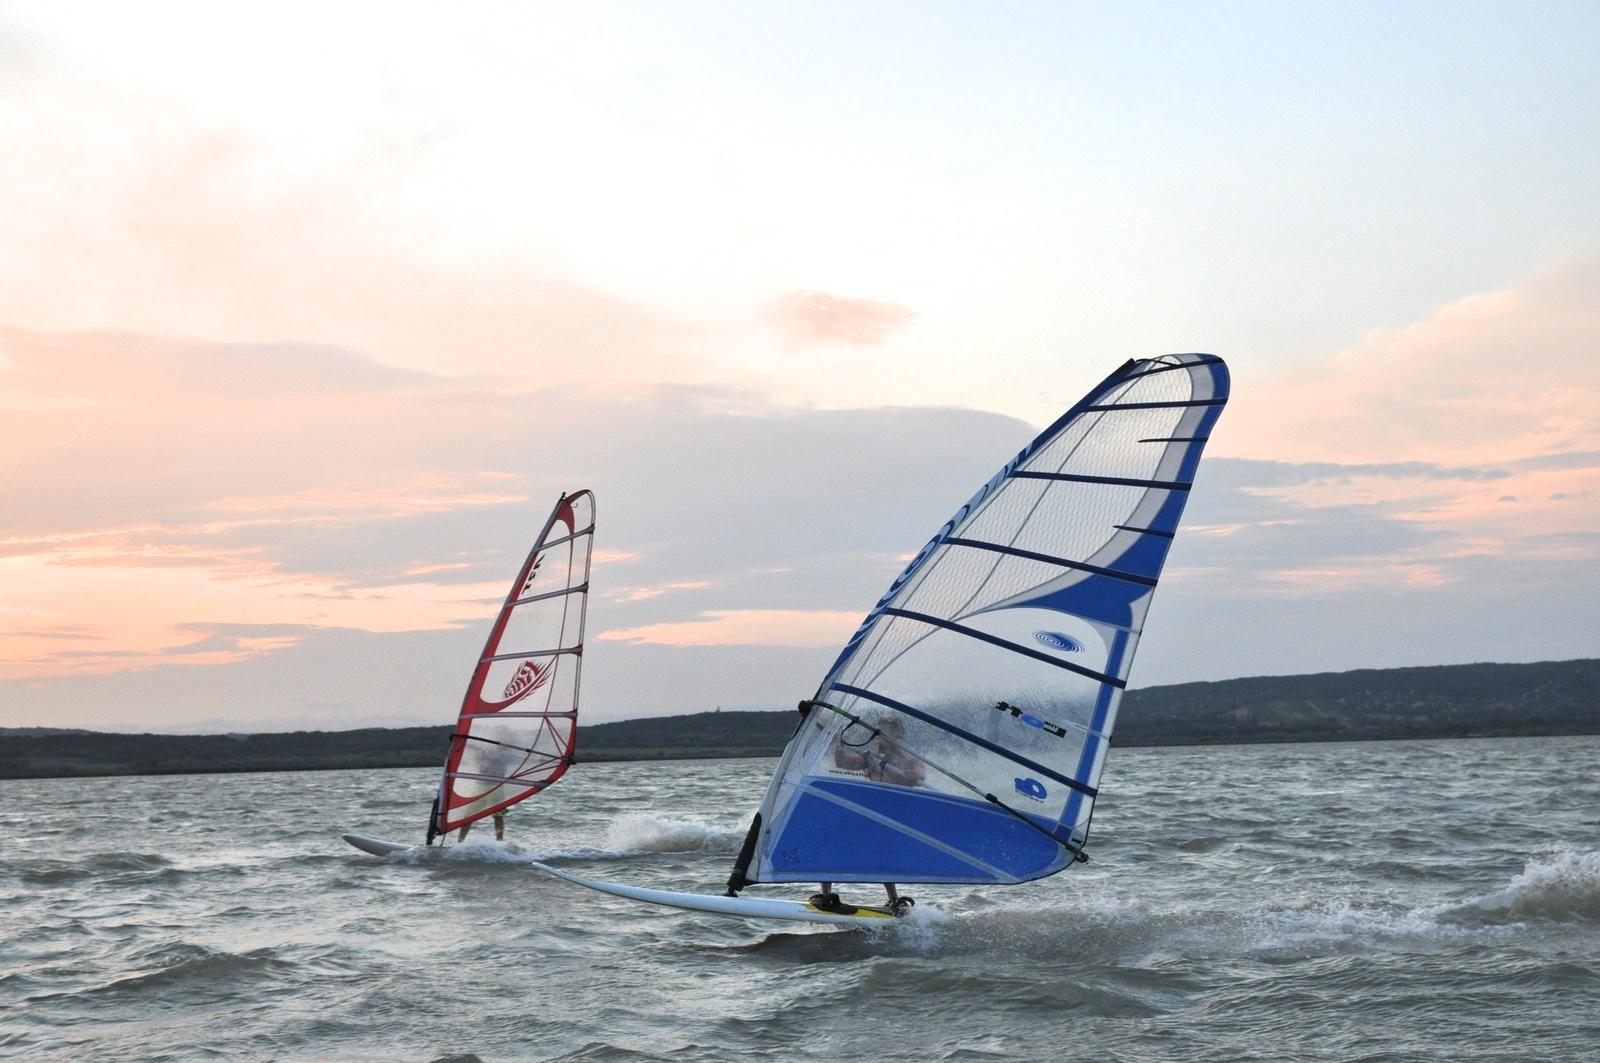 Copy of Windszörf